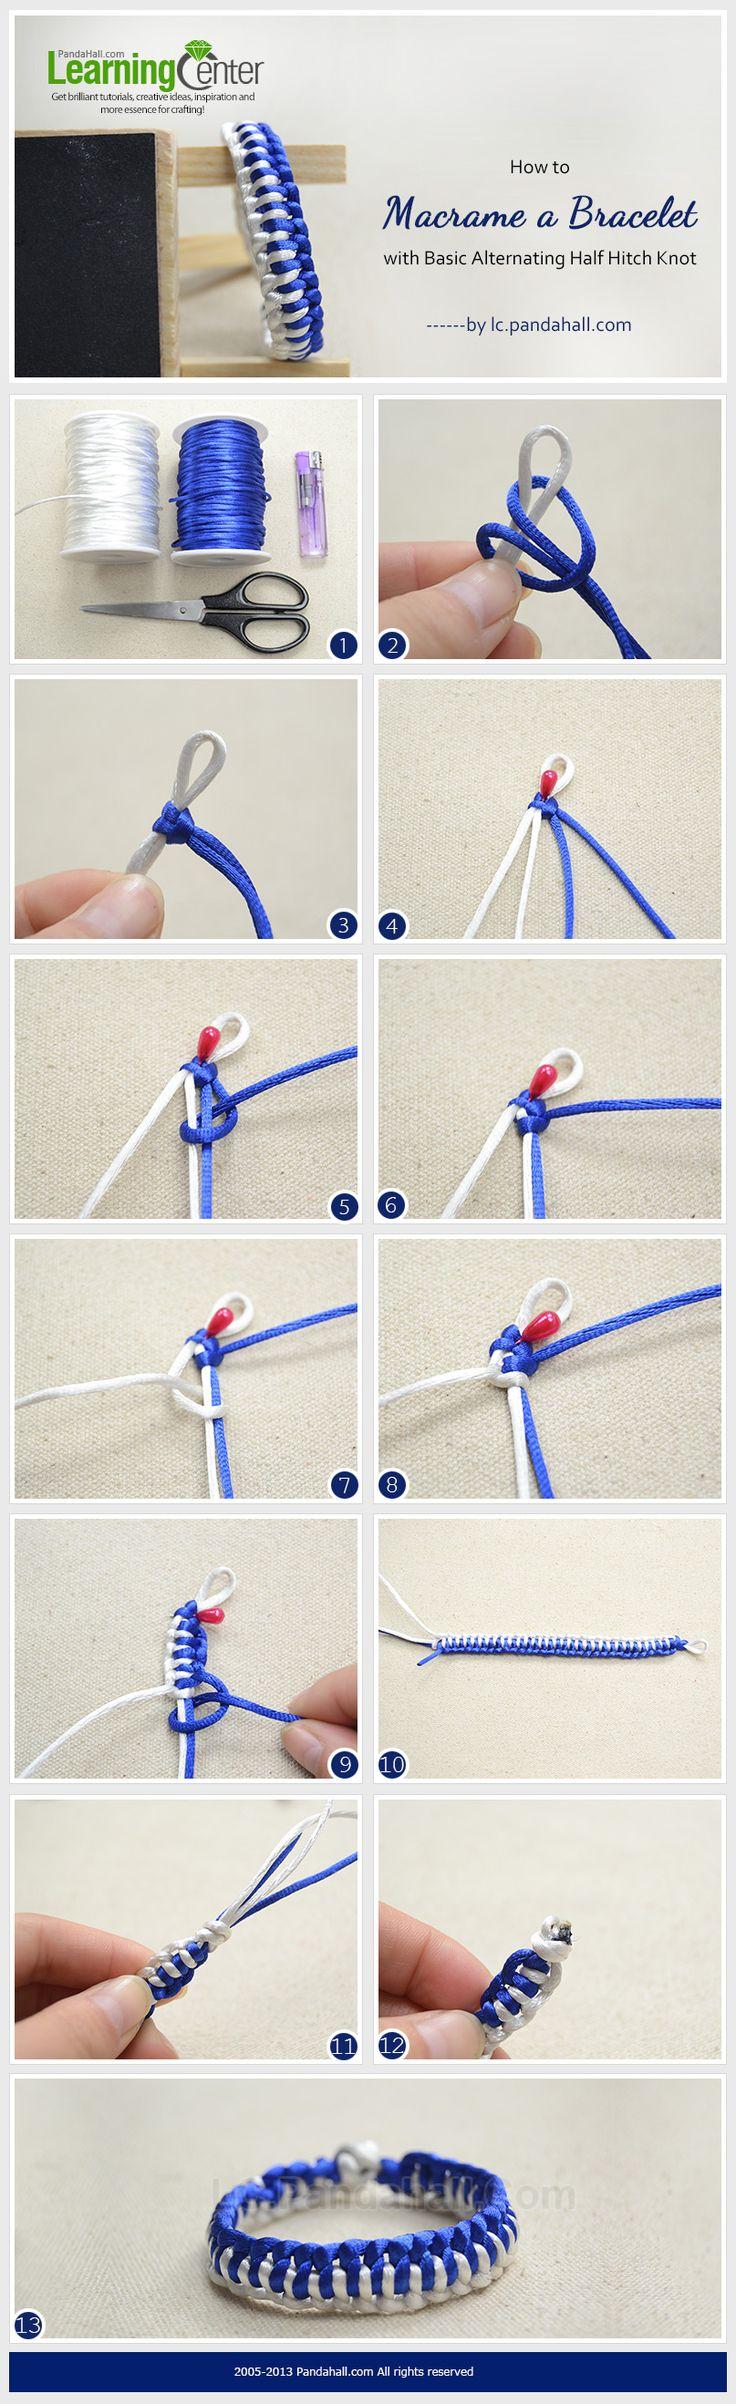 How to Macrame a Bracelet with Basic Alternating Half Hitch Knot great worj please visti my shop MacrameLoveJewelry.etsy.com                                                                                                                                                      Más